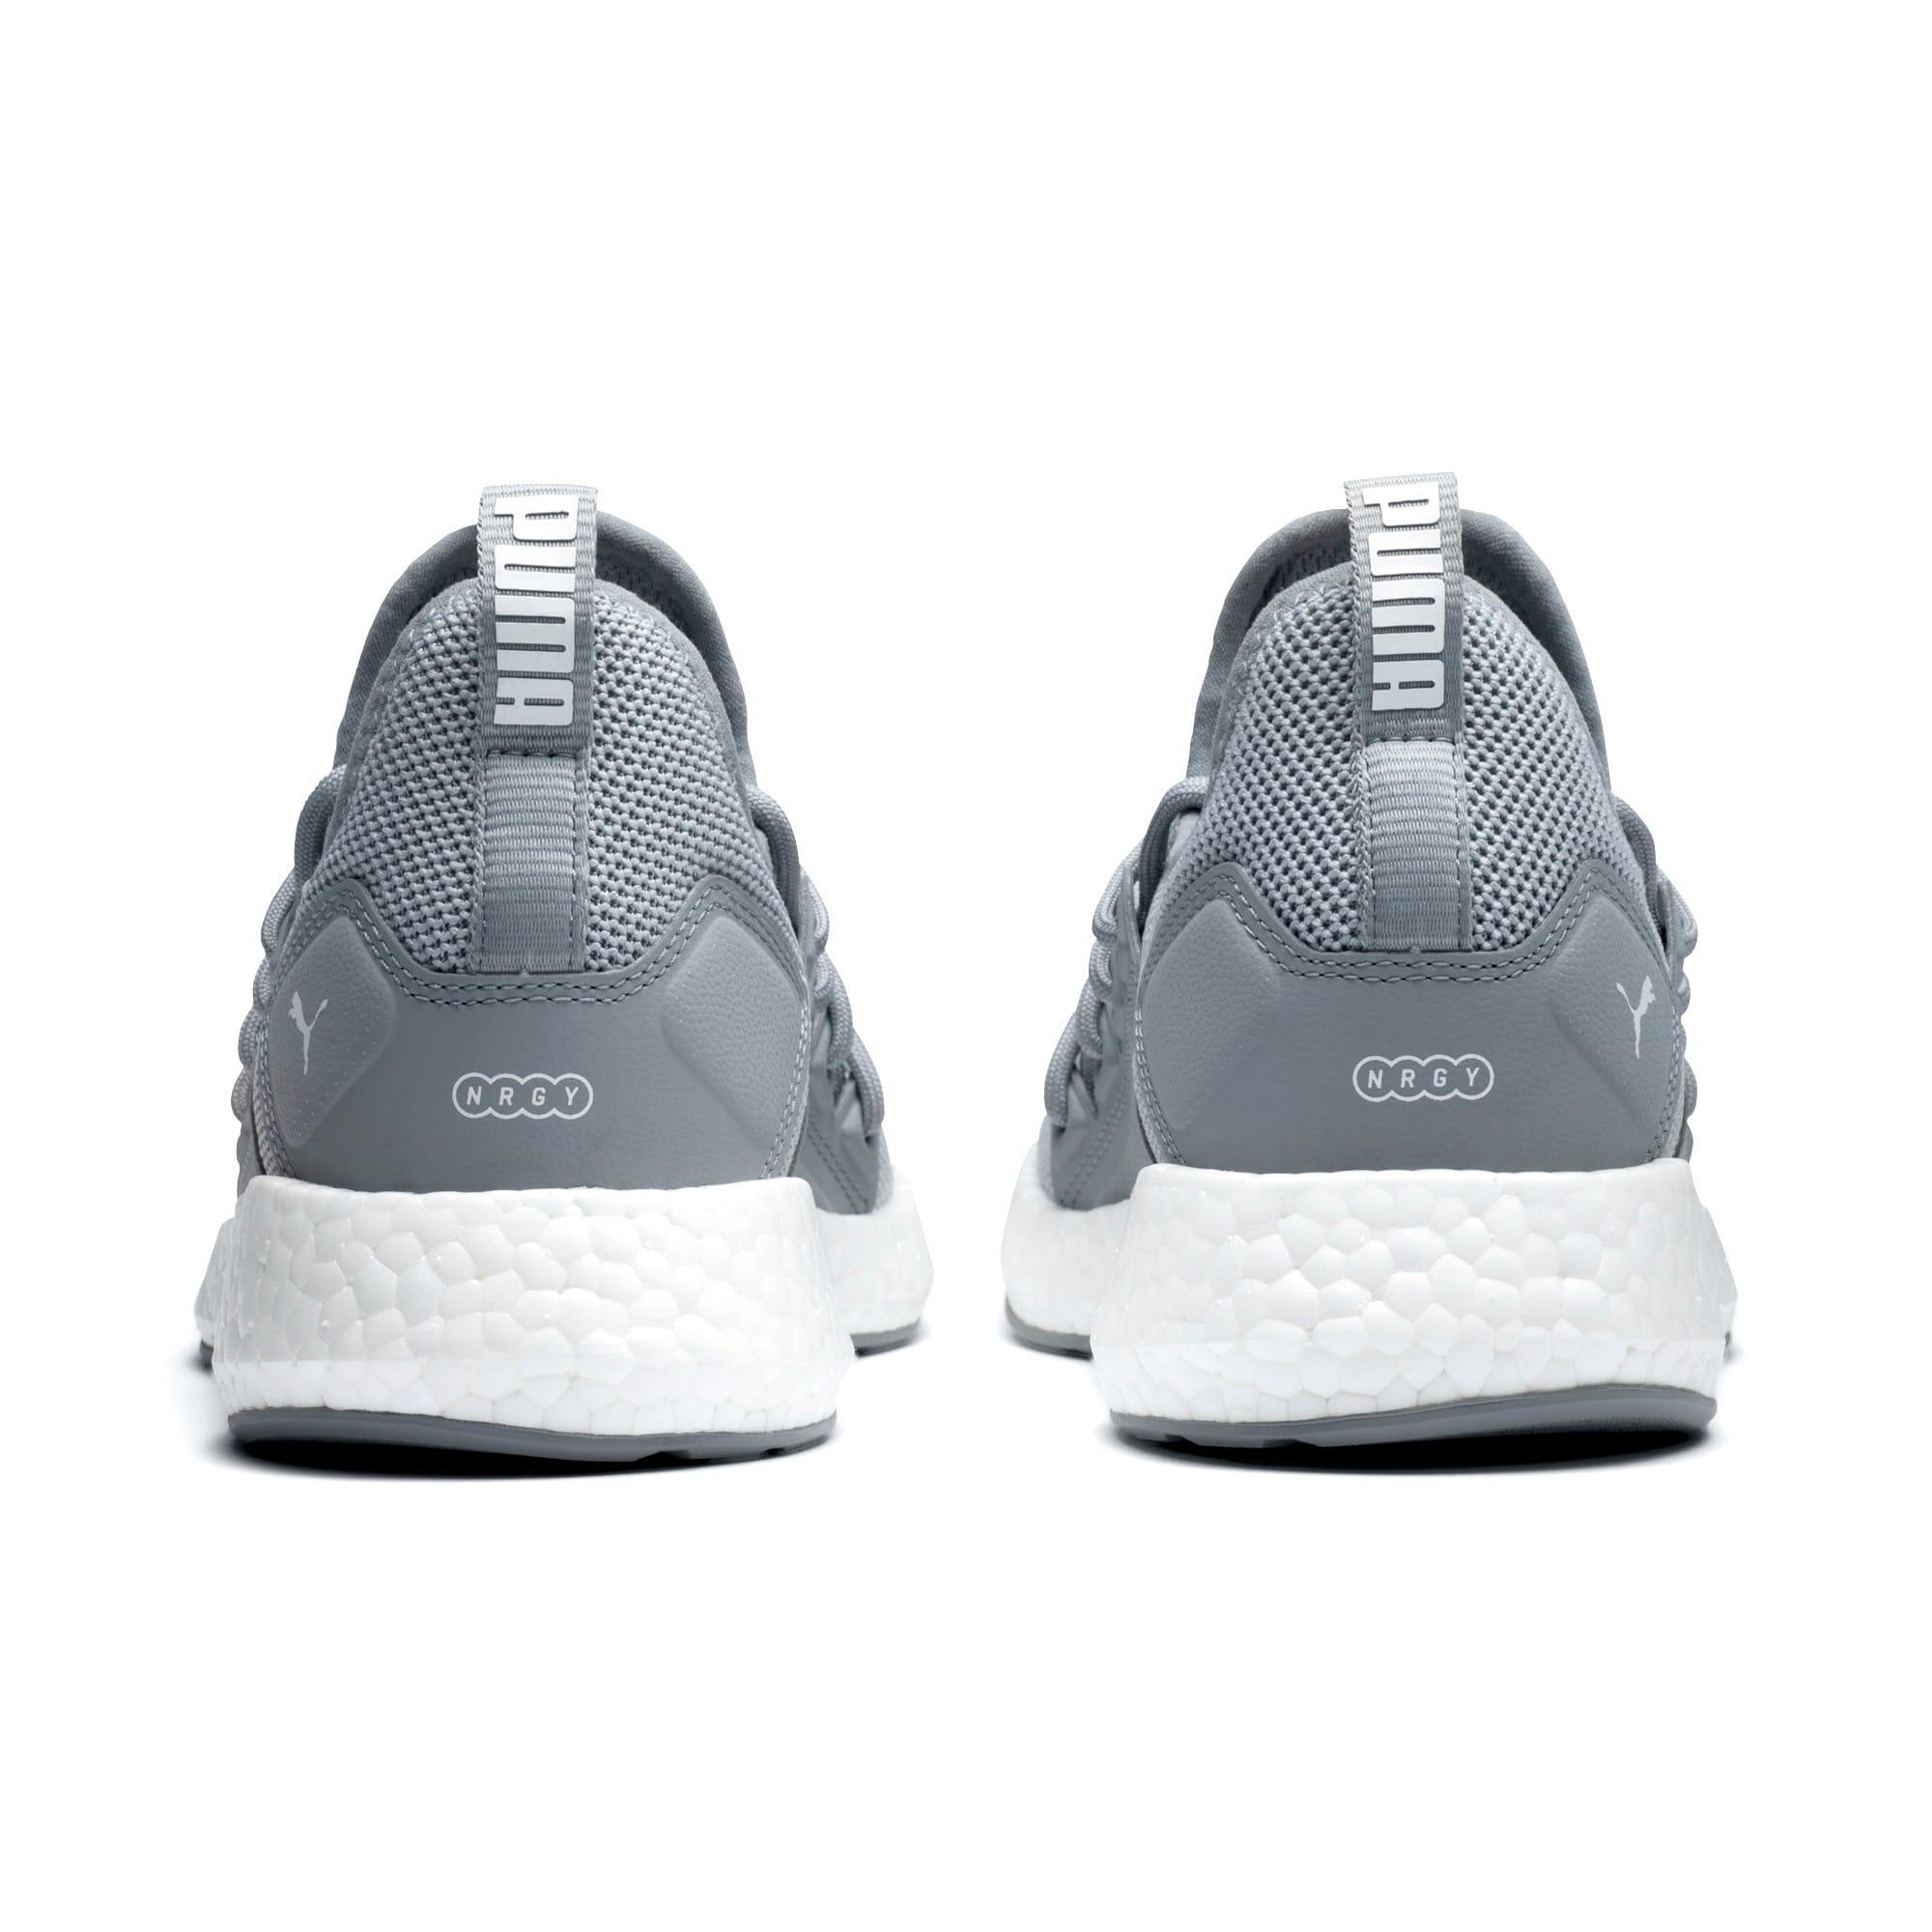 Thumbnail 4 of NRGY Neko Women's Running Shoes, Quarry-Puma White, medium